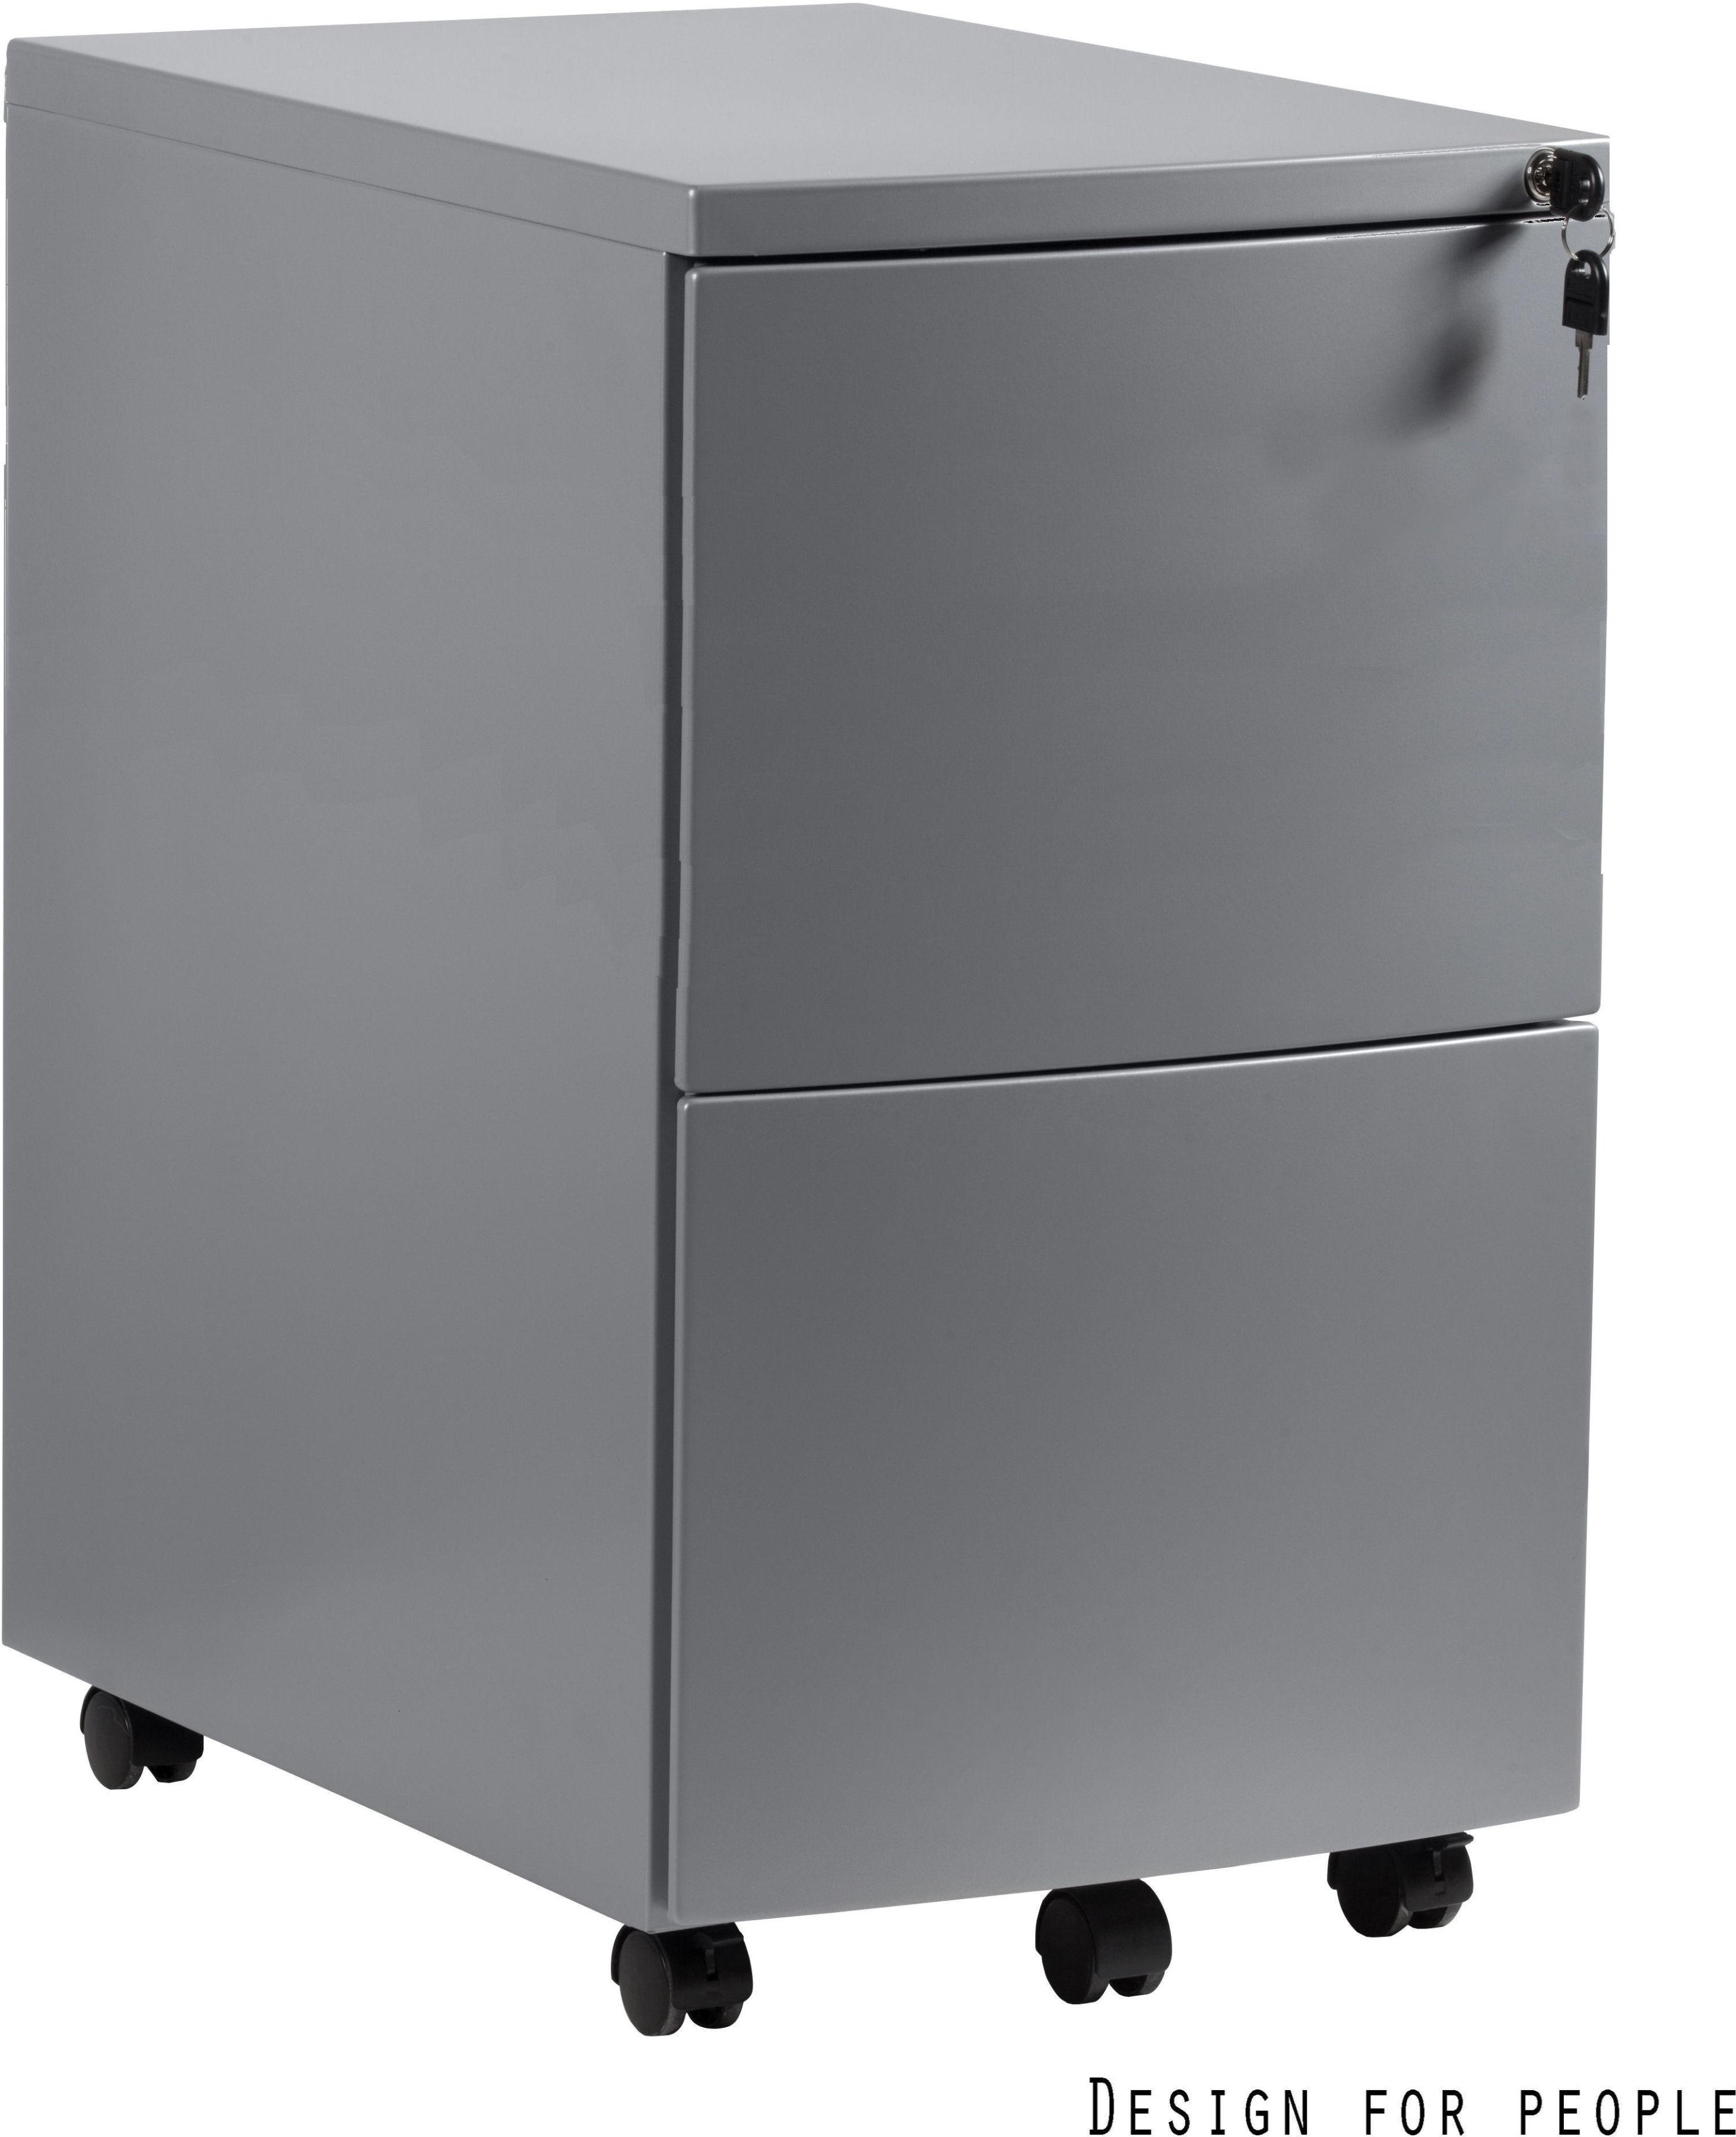 Kontener biurowy 39x56x64 cm RPH-02-S srebrny